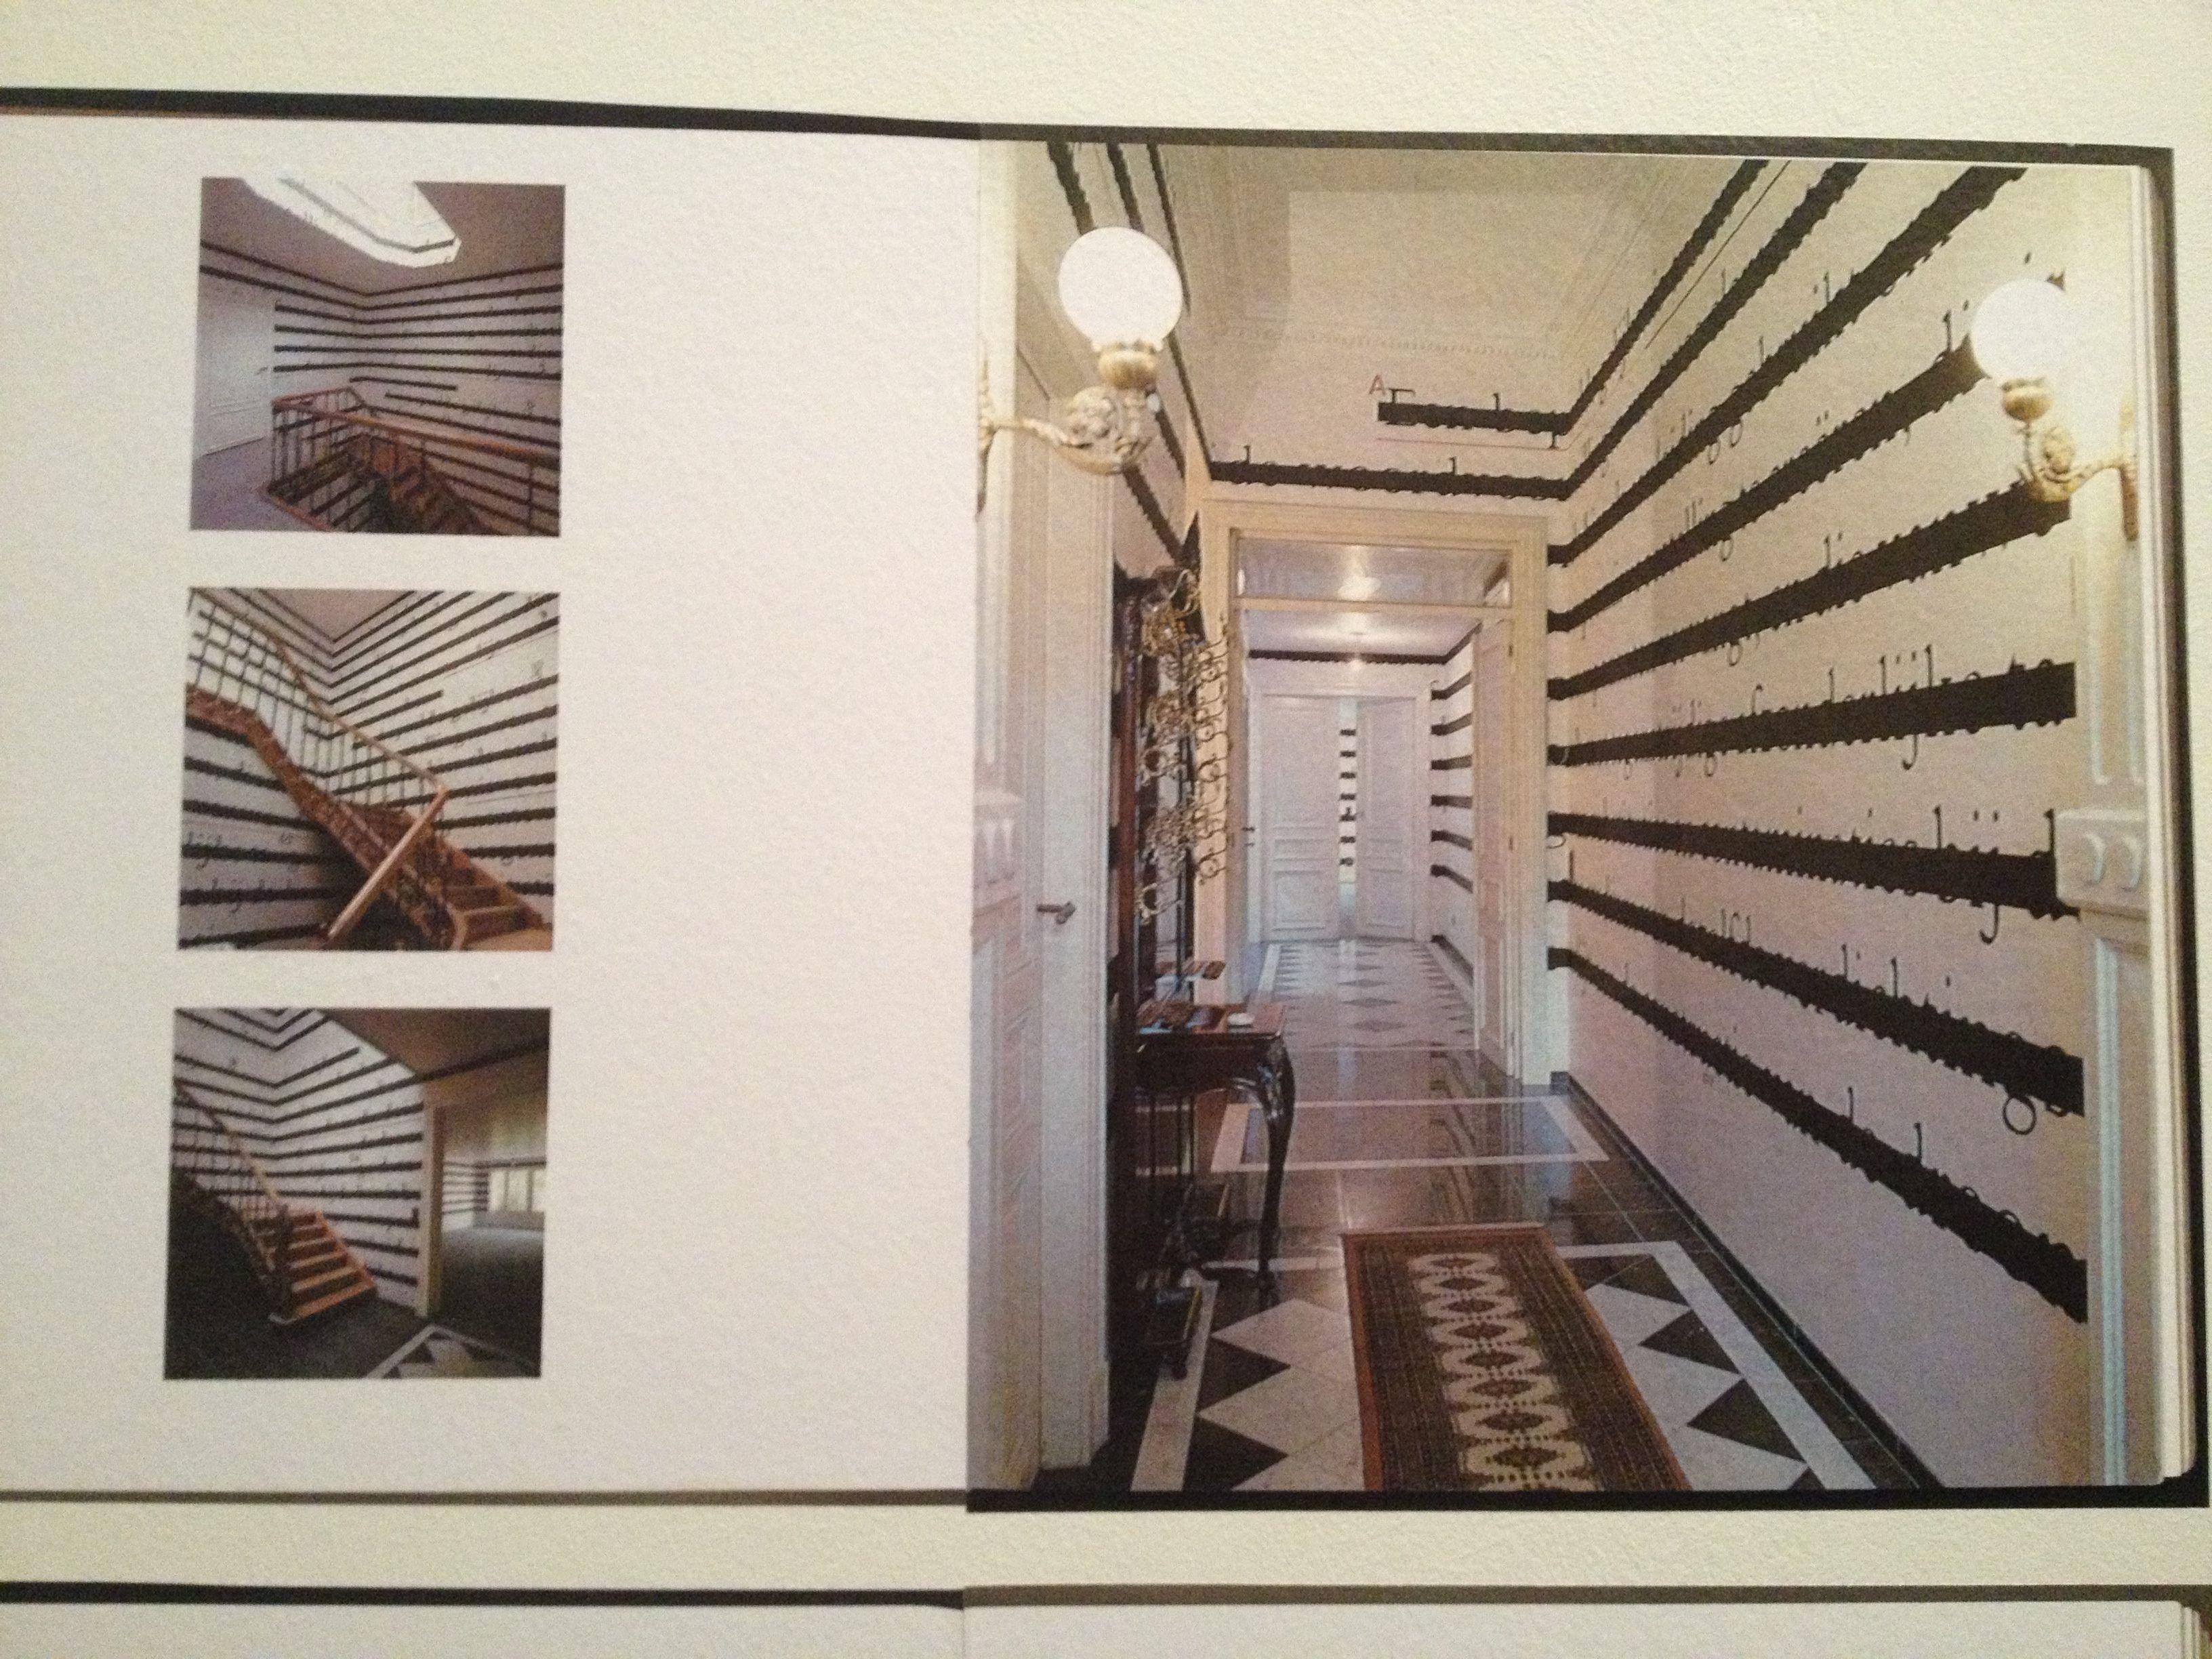 Joseph Kosuth 39 S Wallpaper At A Psychiatrist 39 S House